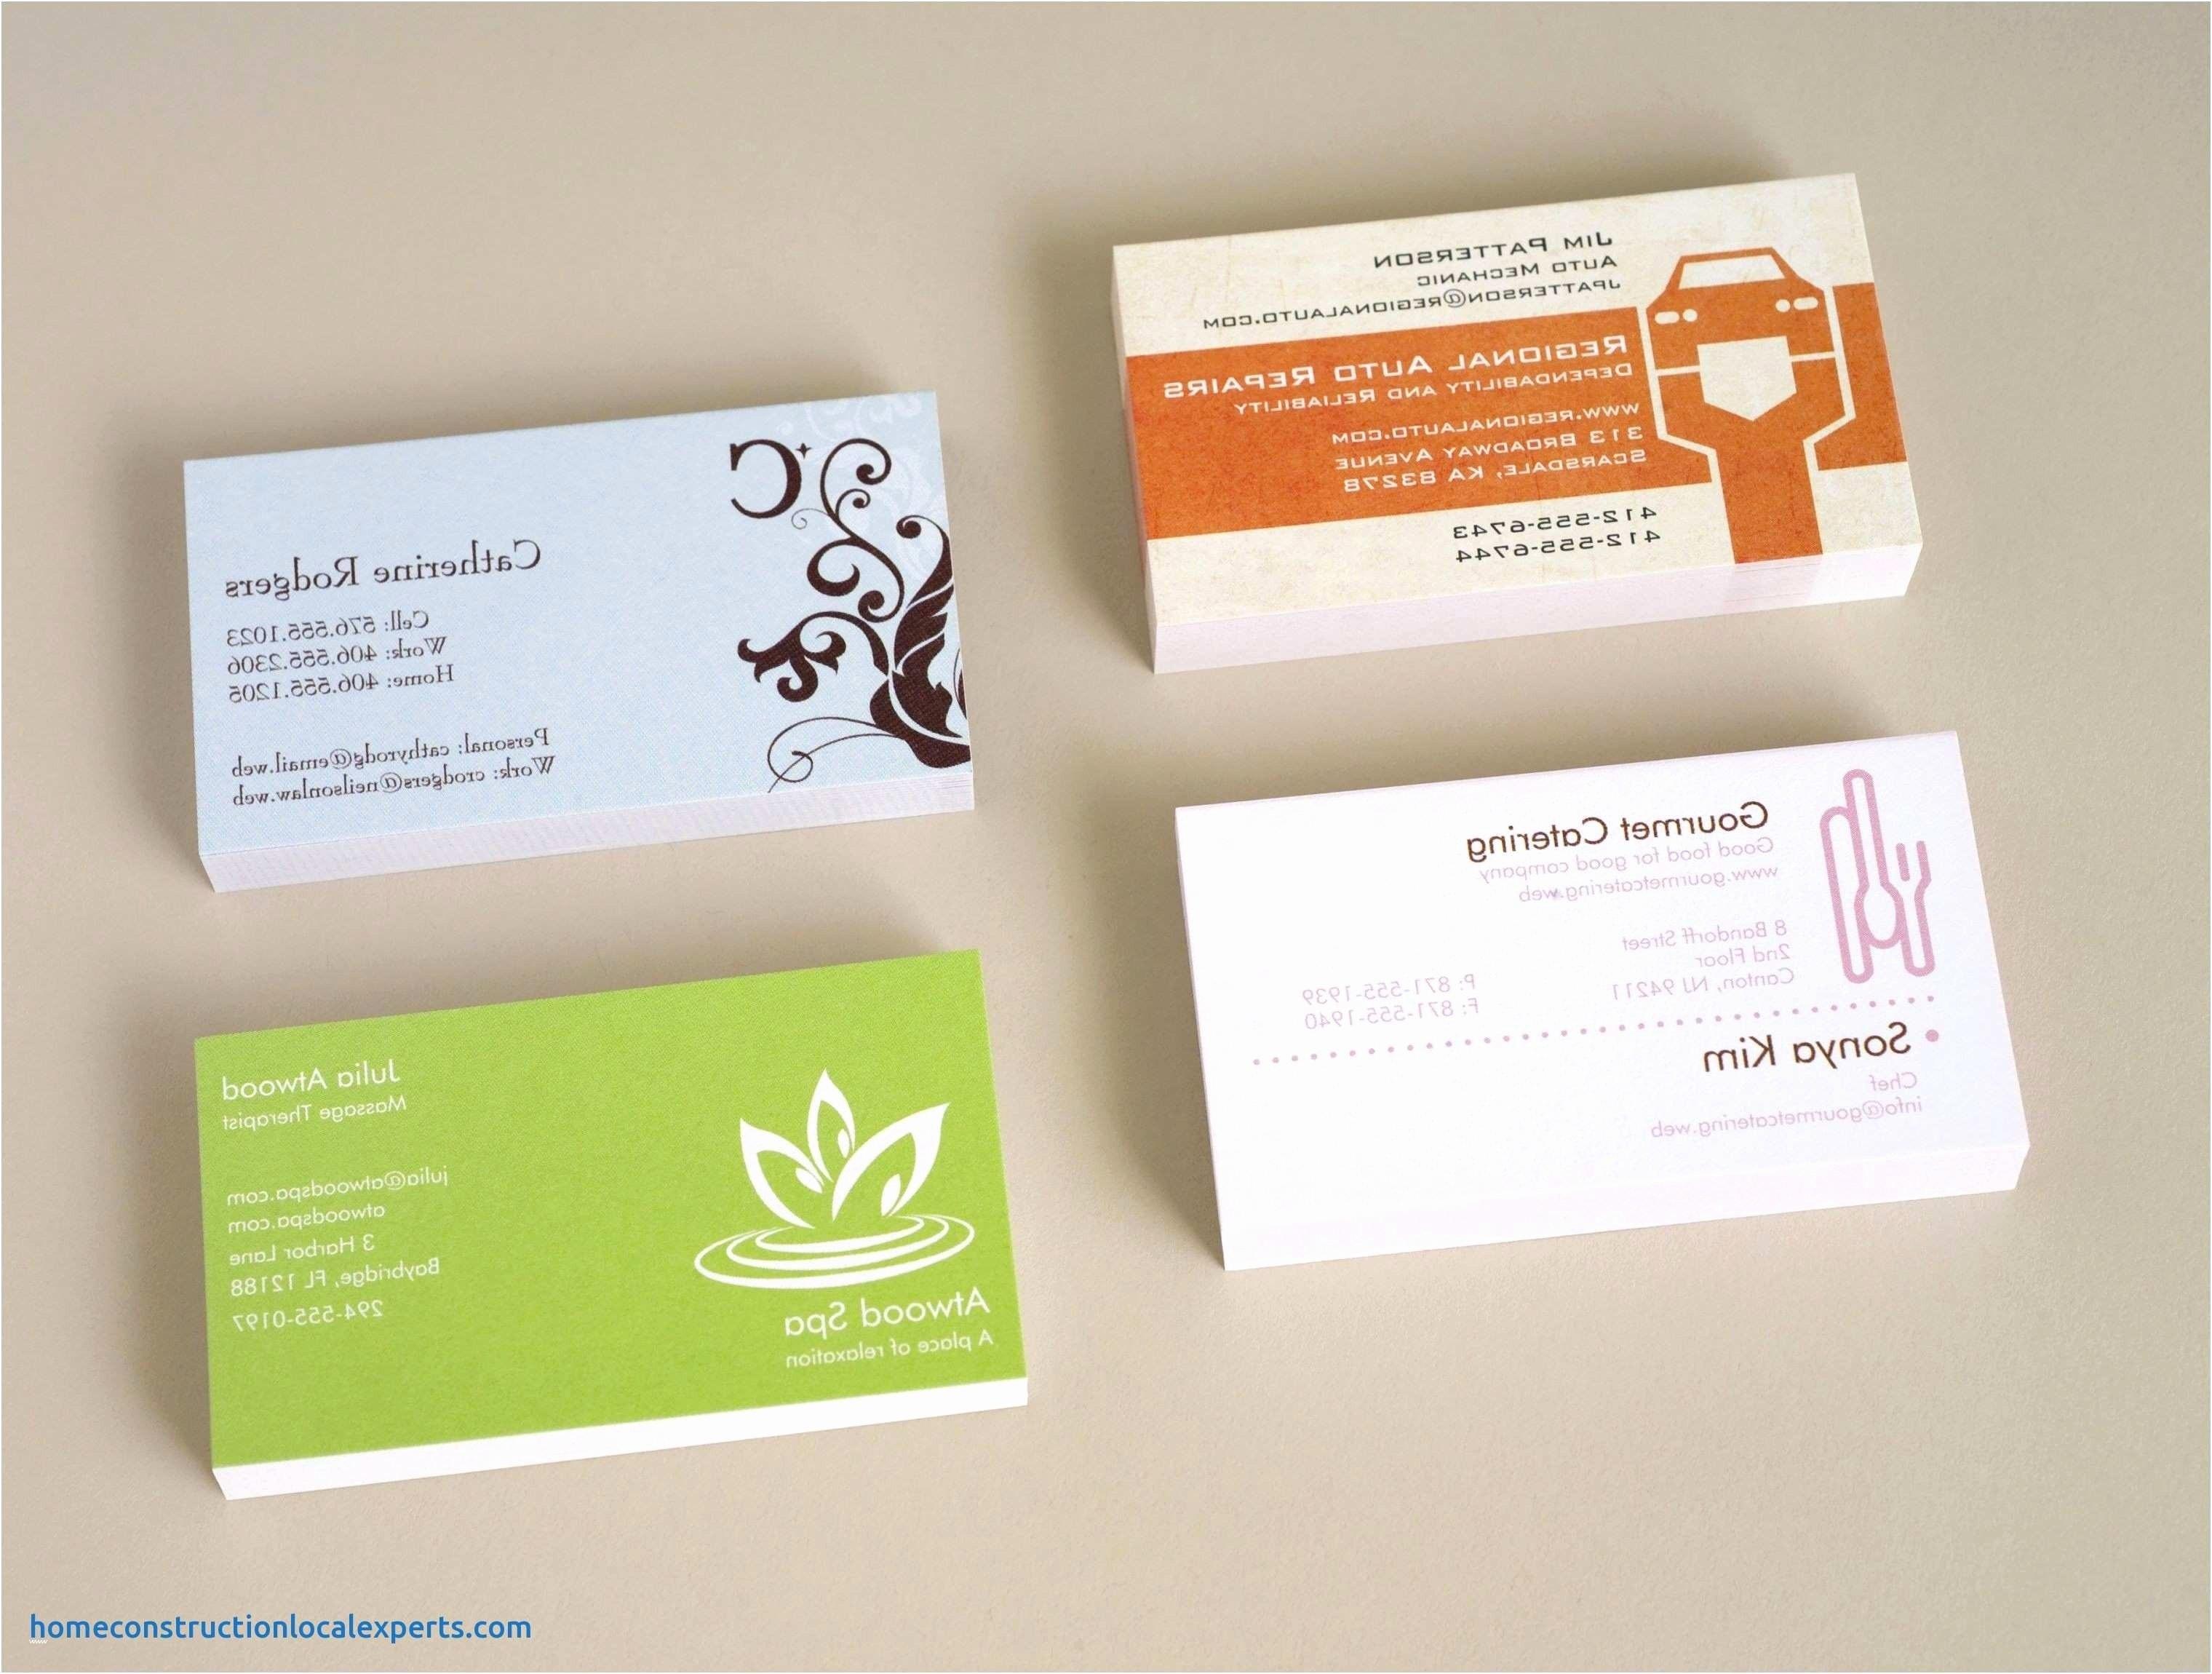 Print Business Cards At Kinkos Elegant Overnight Prints Business Regarding Kinkos Business Card Template